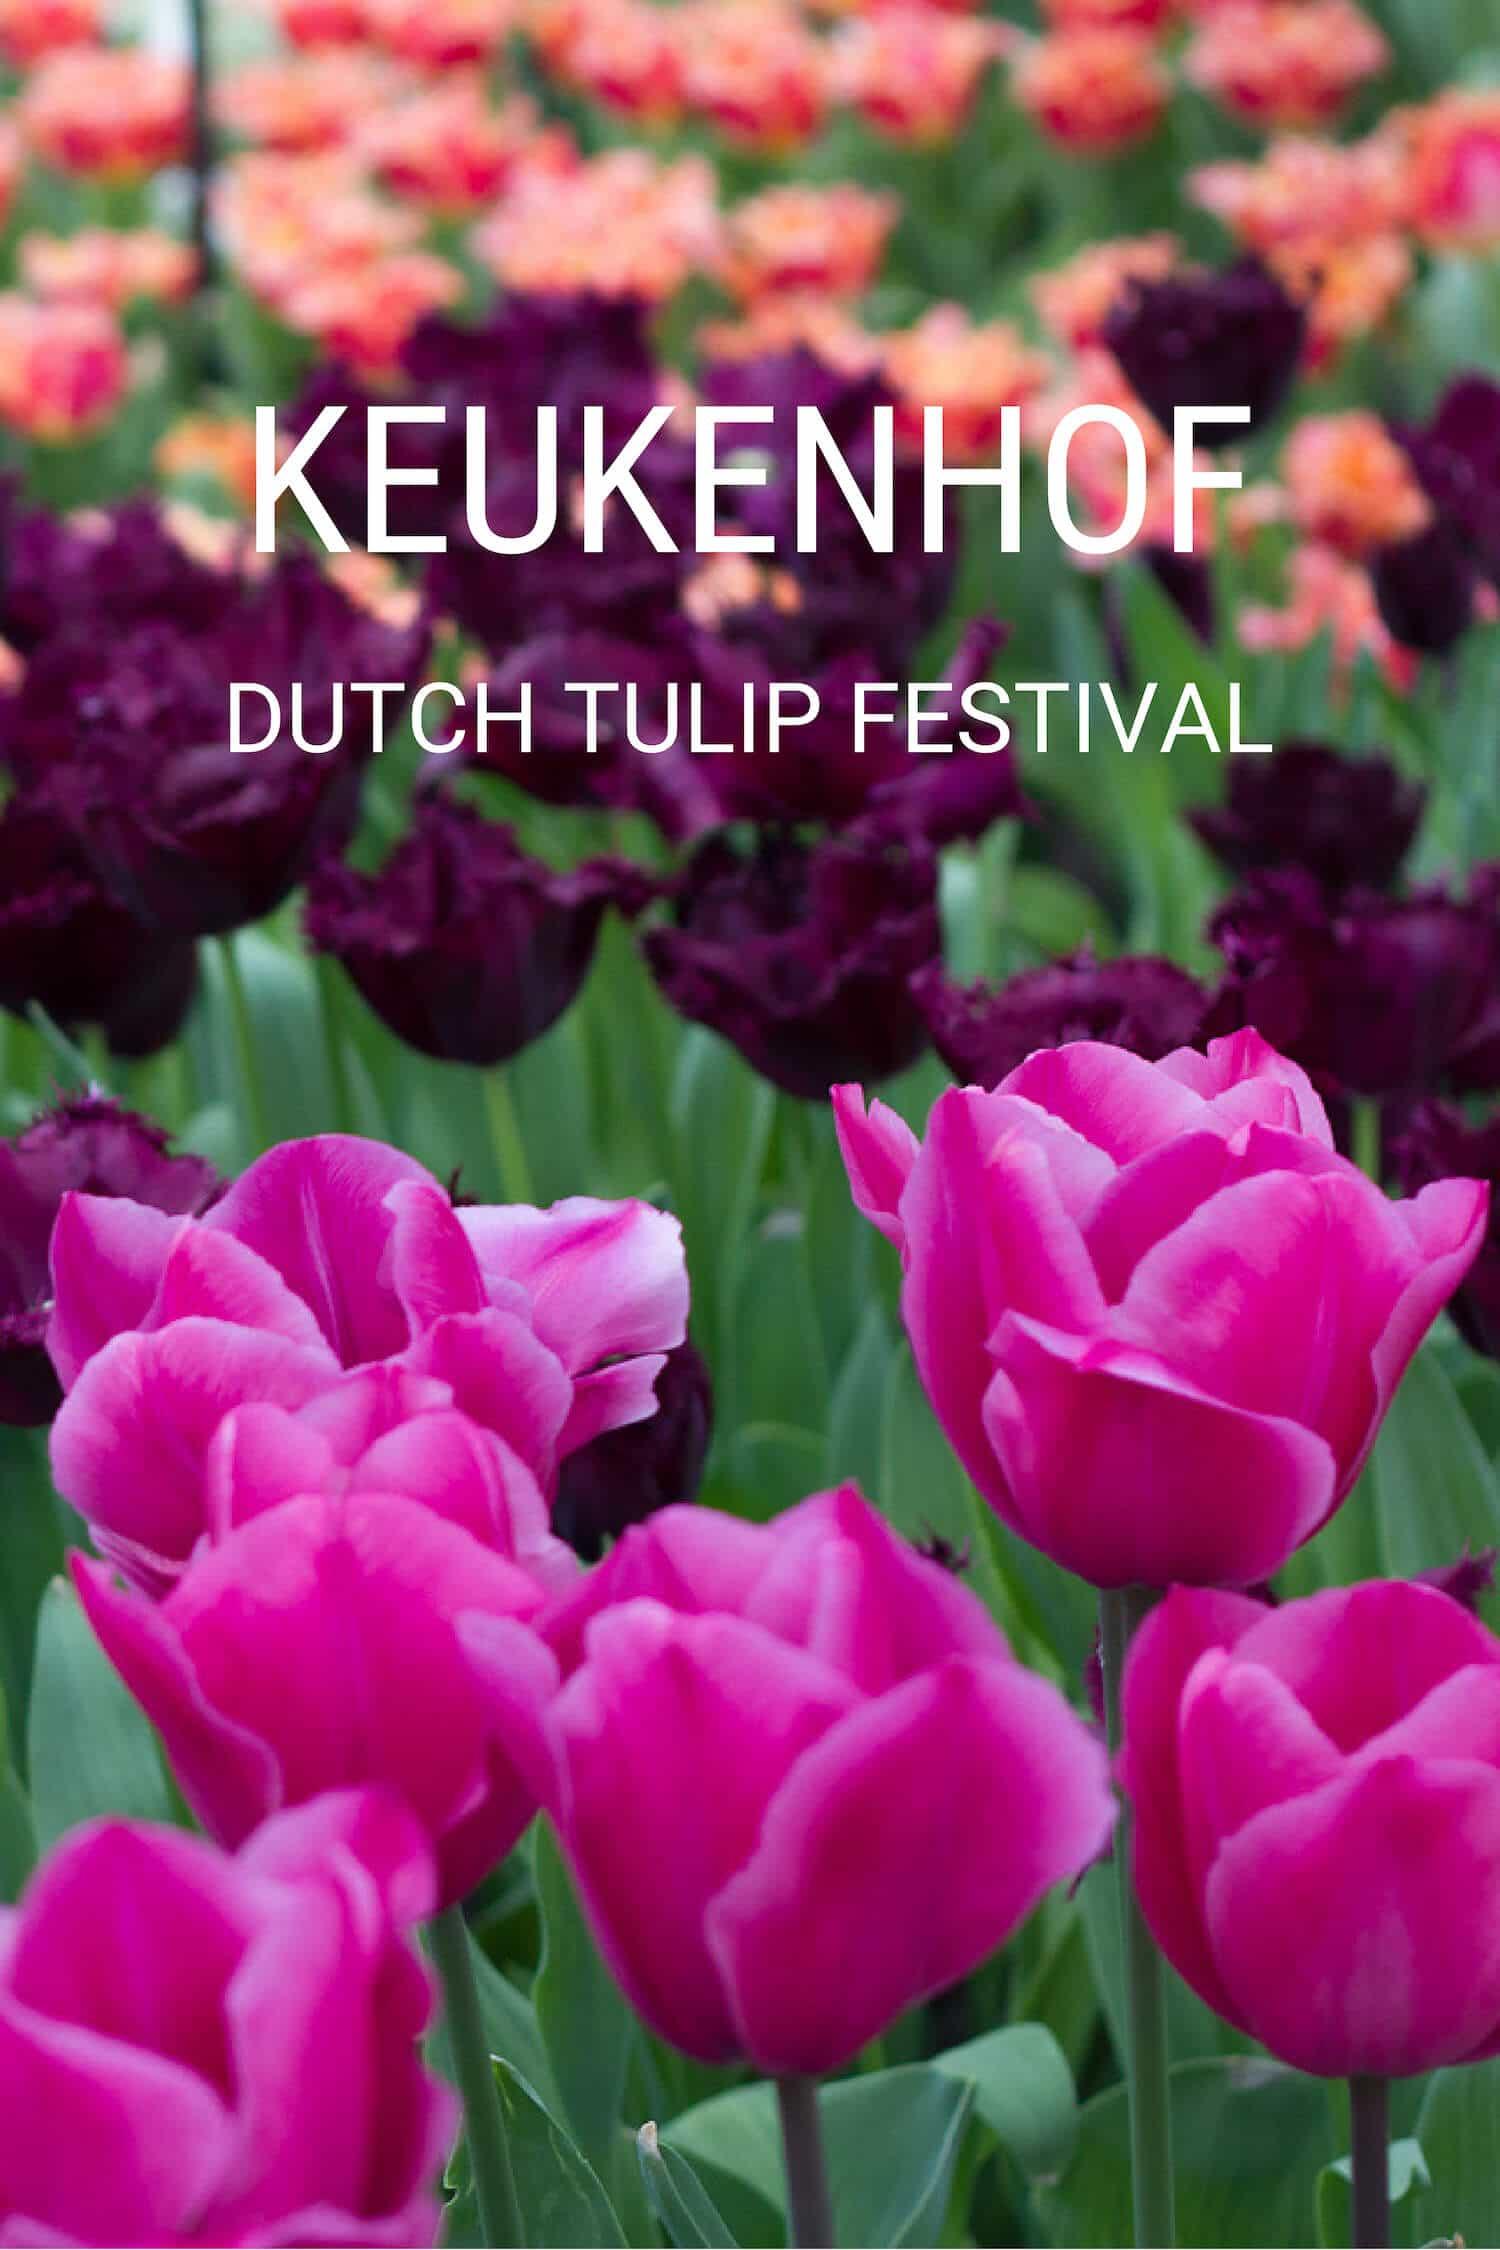 Keukenhof Dutch Tulip Festival Guide